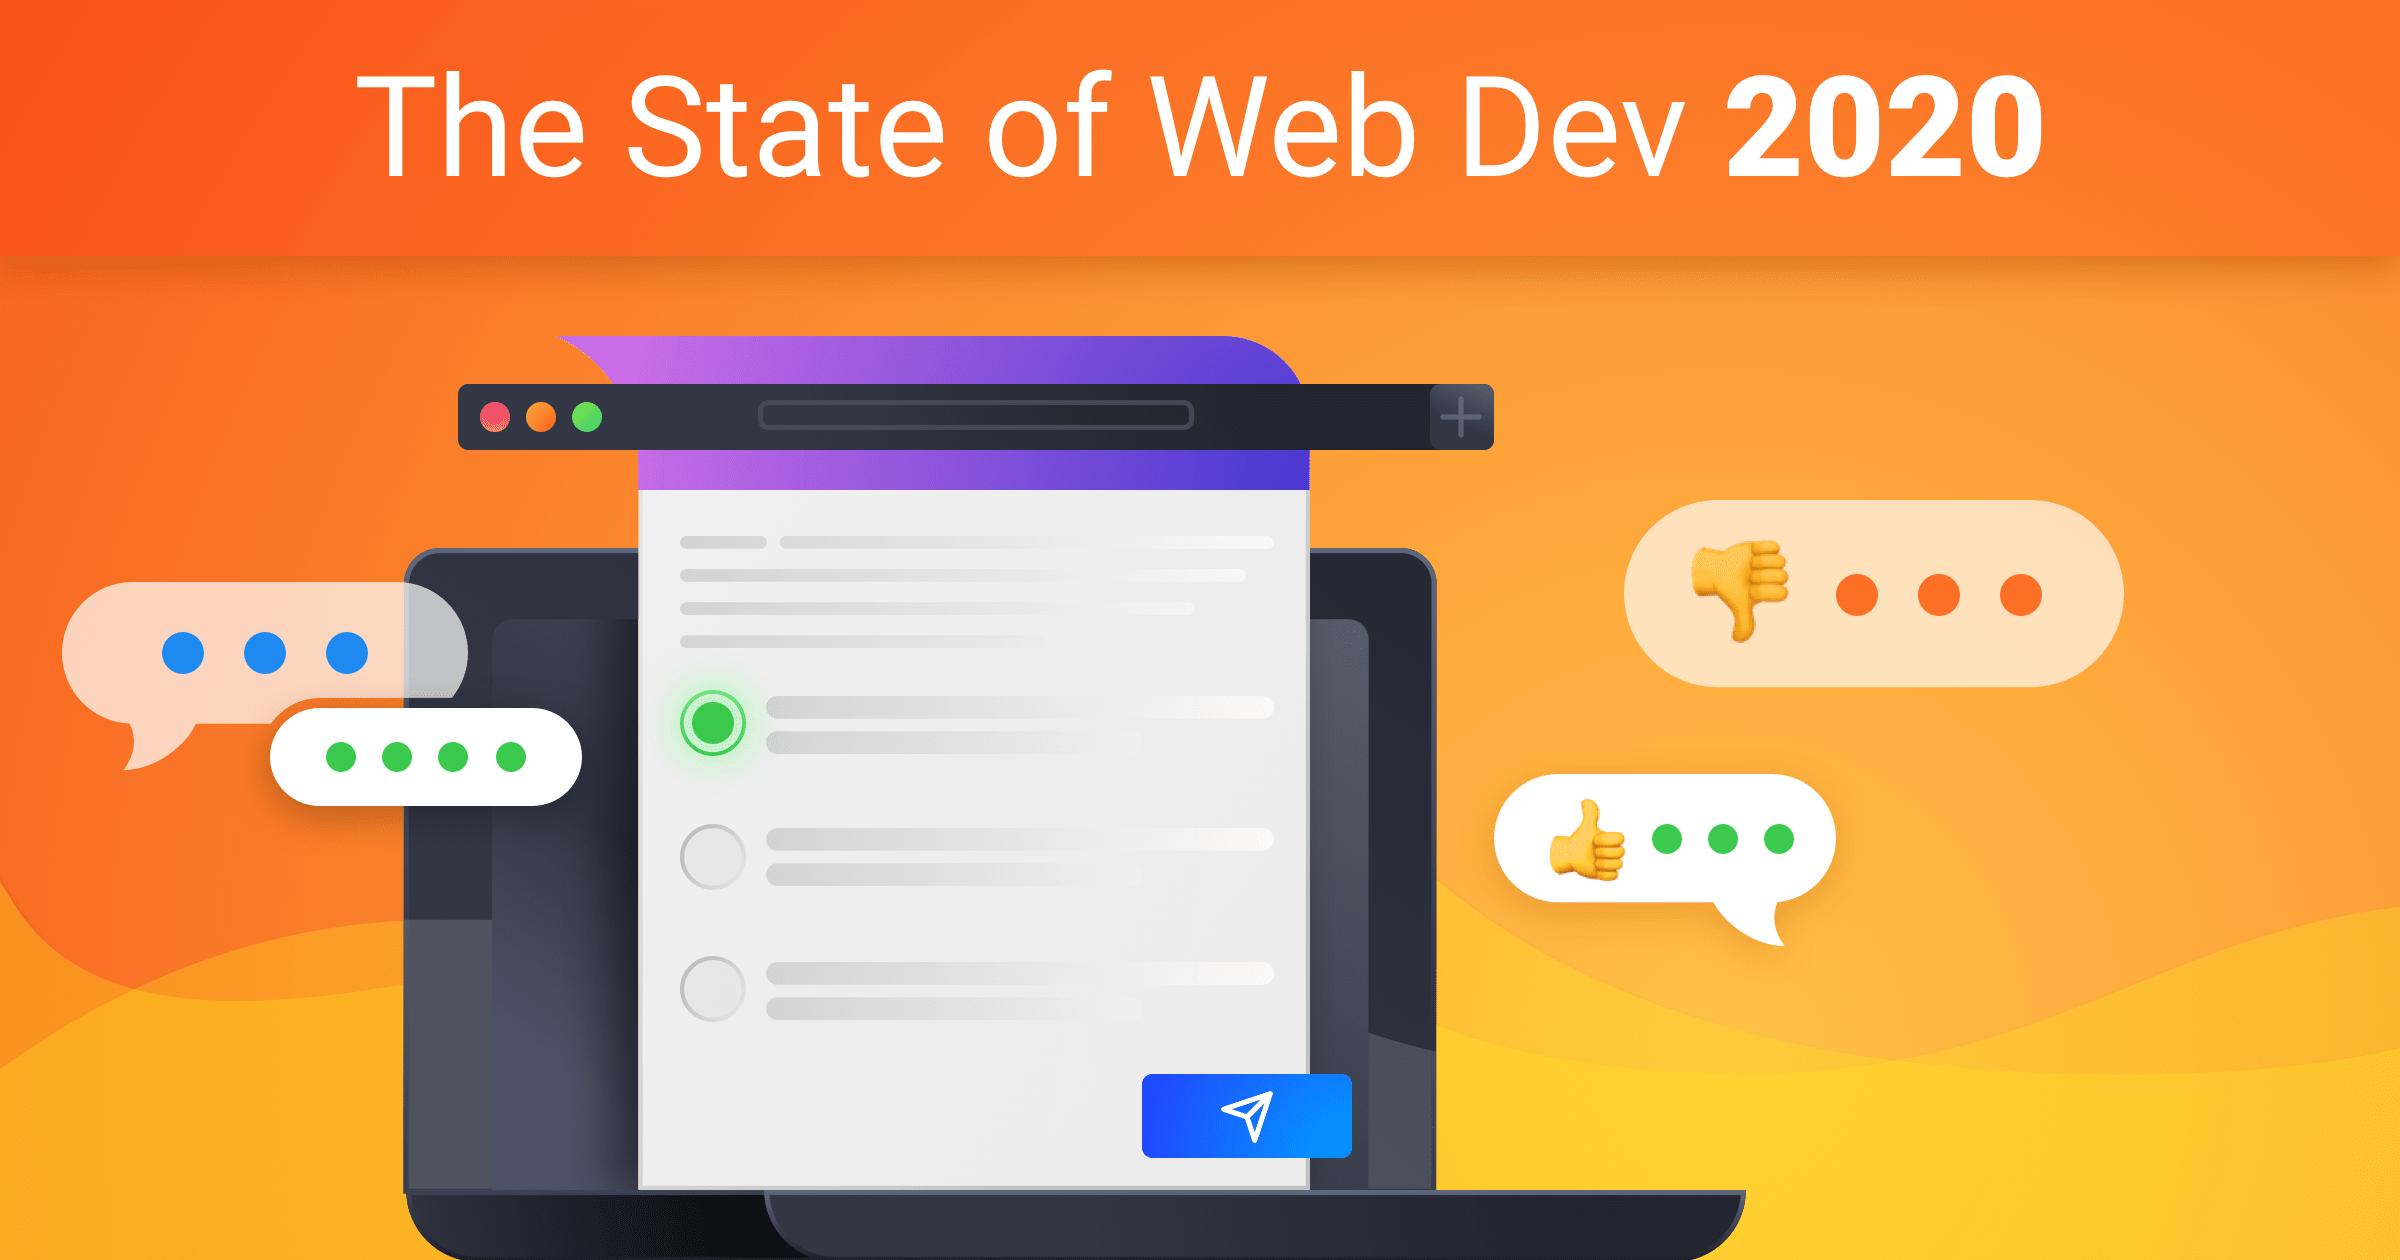 The State of Web Development 2020! Survey